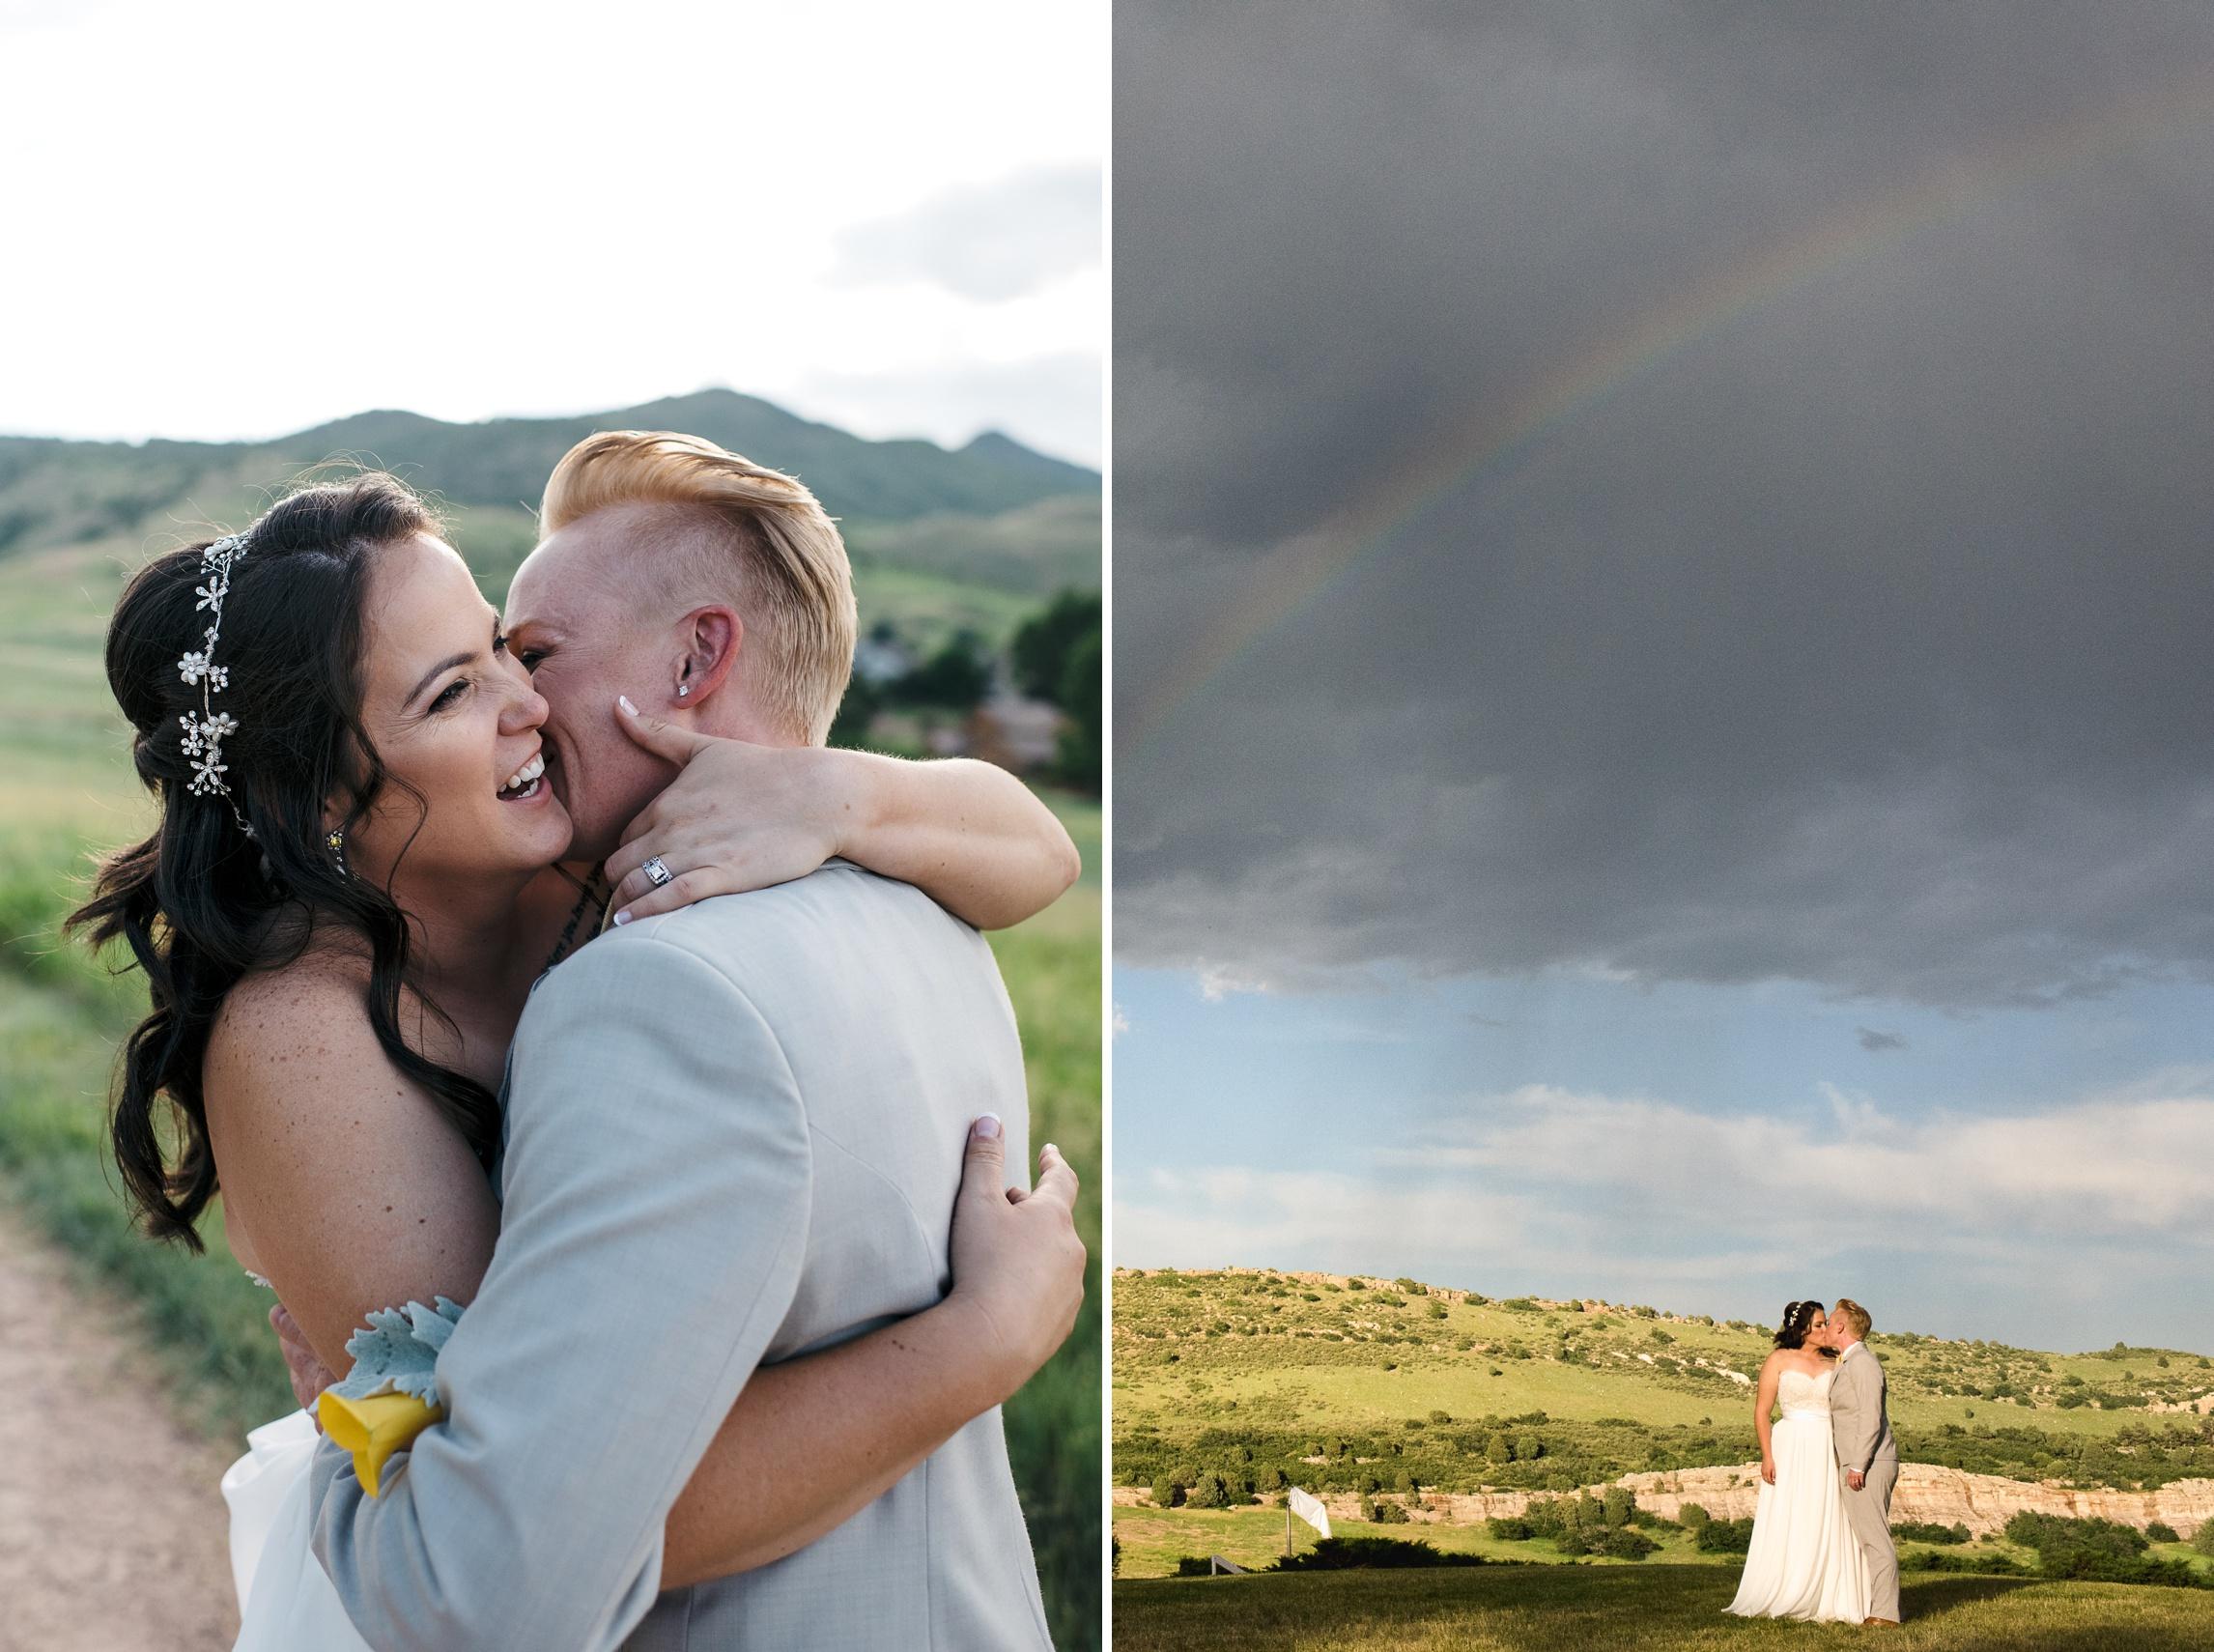 An awesome wedding outside Denver, Colorado. Wedding photography by Sonja Salzburg of Sonja K Photography.